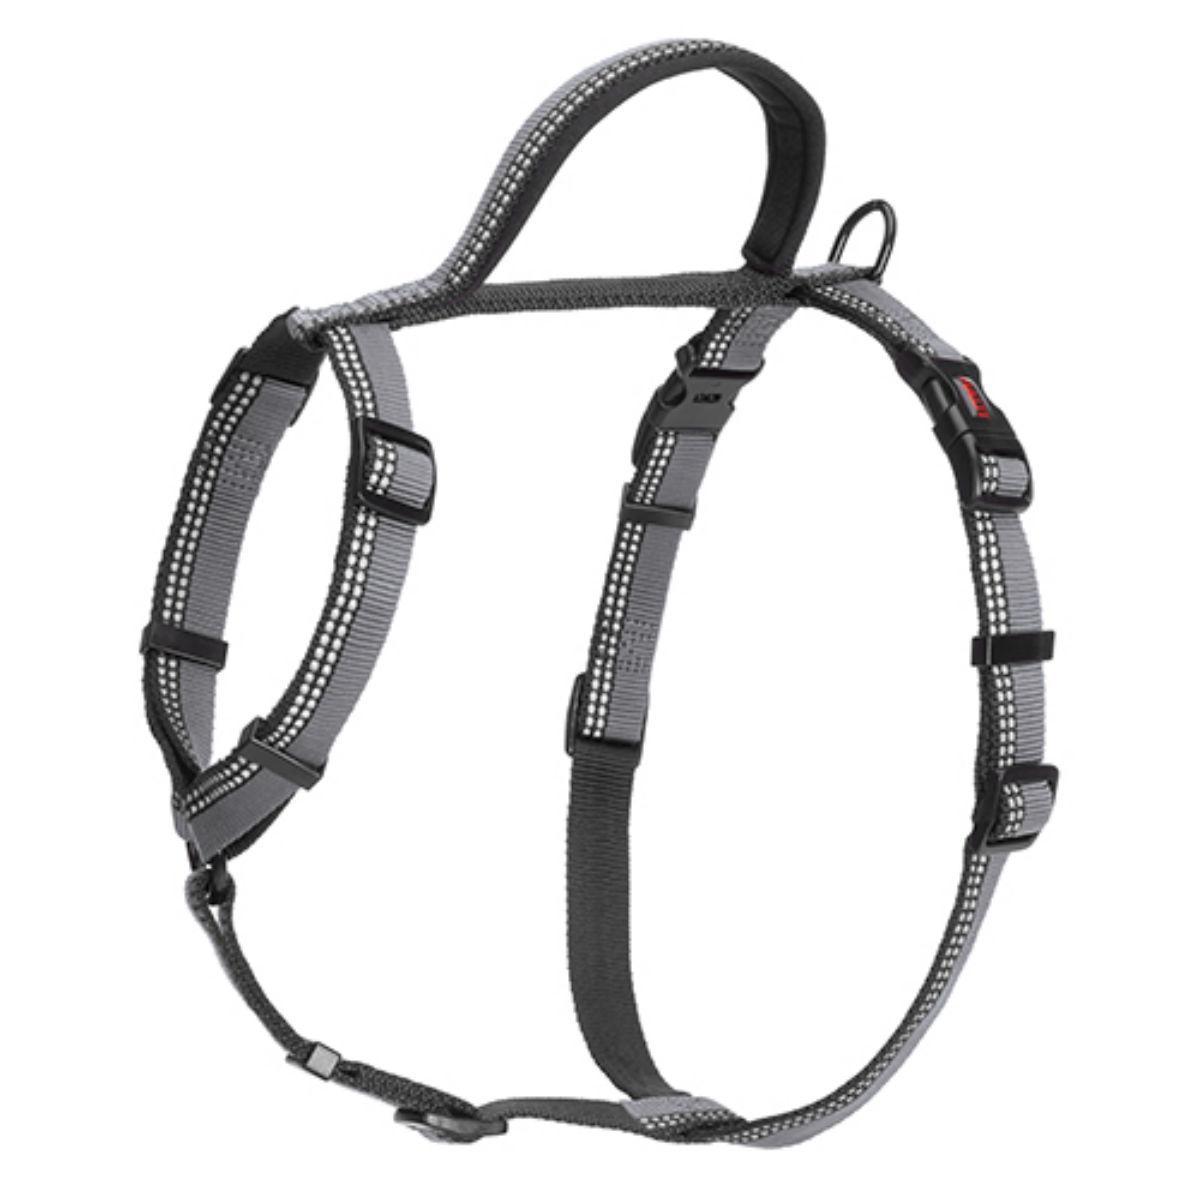 Halti Walking Dog Harness - Black and Gray